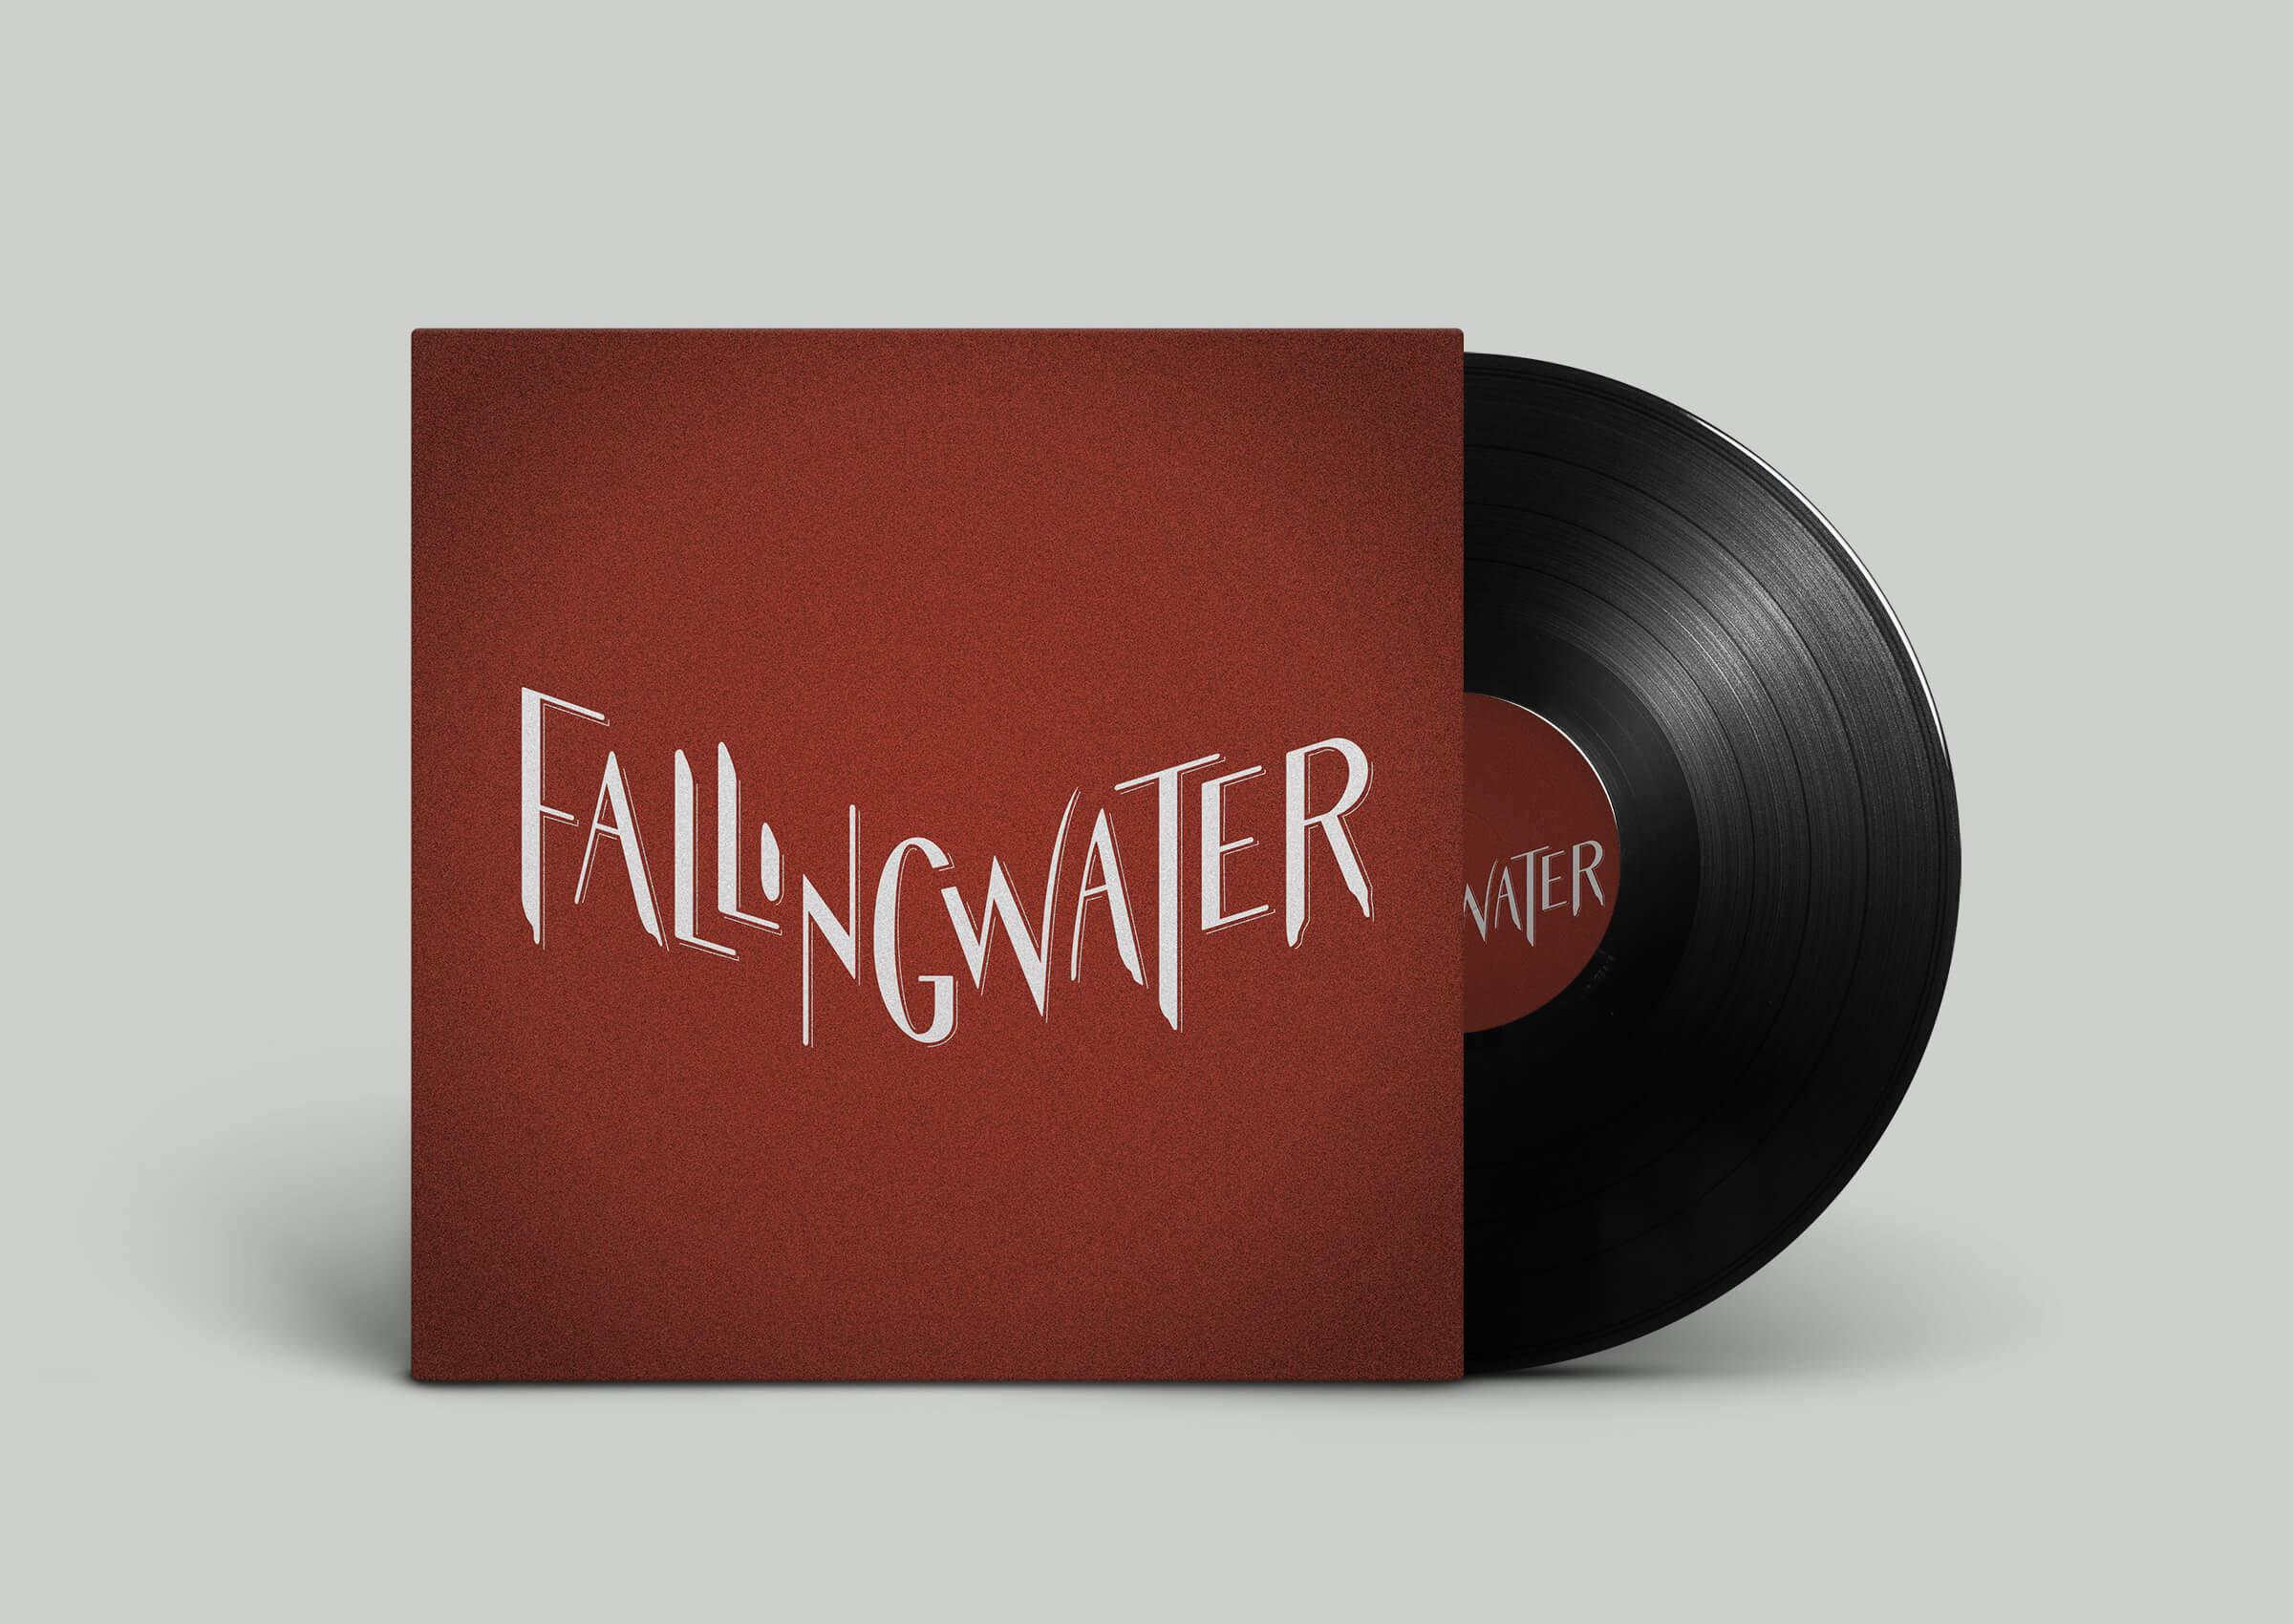 Fallingwater vinyl